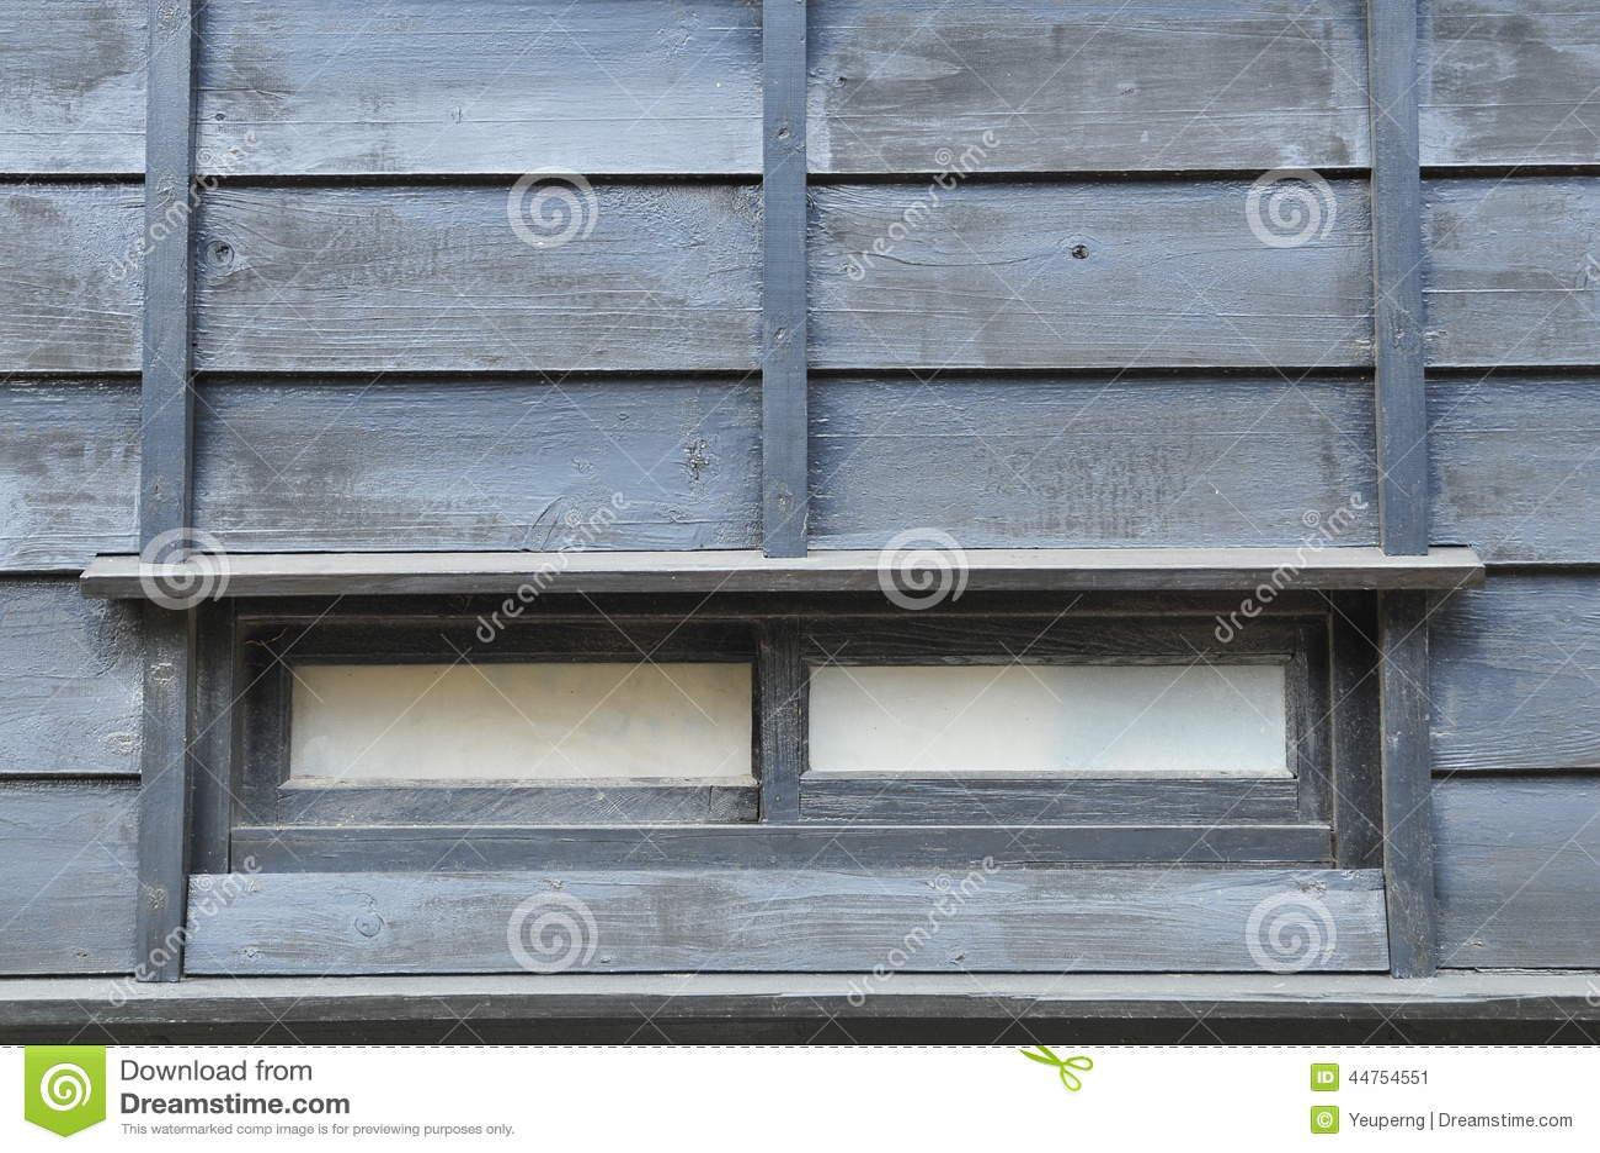 Old ventilation window. stock image. Image of ventilation - 44754551 : ventilation fönster : Fönster